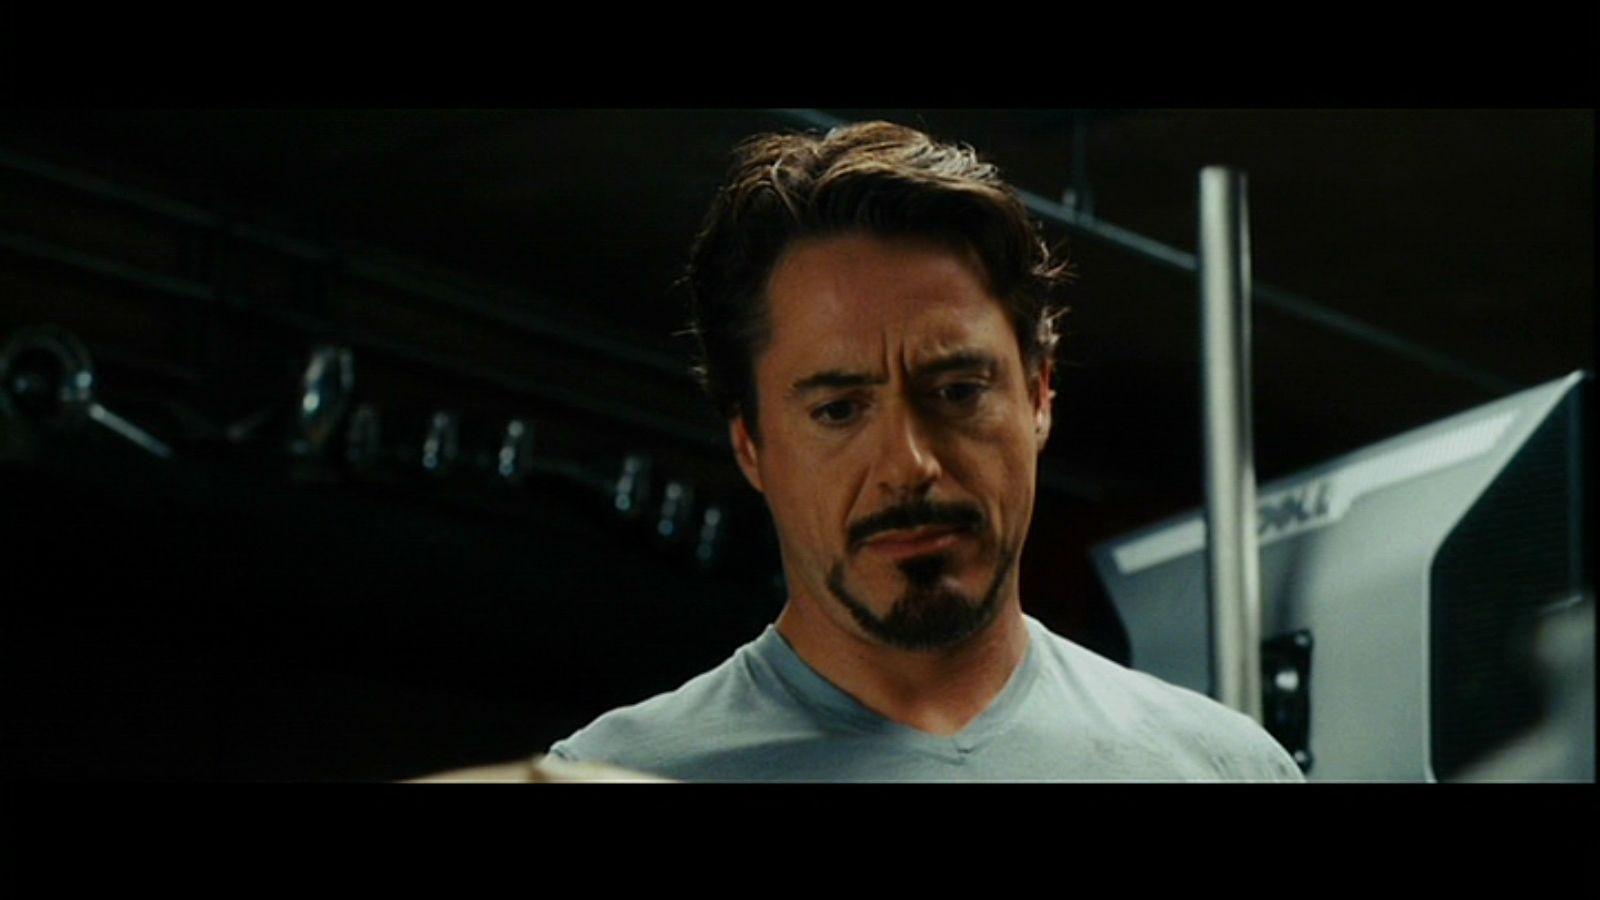 Iron Man Iron Man 1206 Screencaps Iron Man Tony Stark